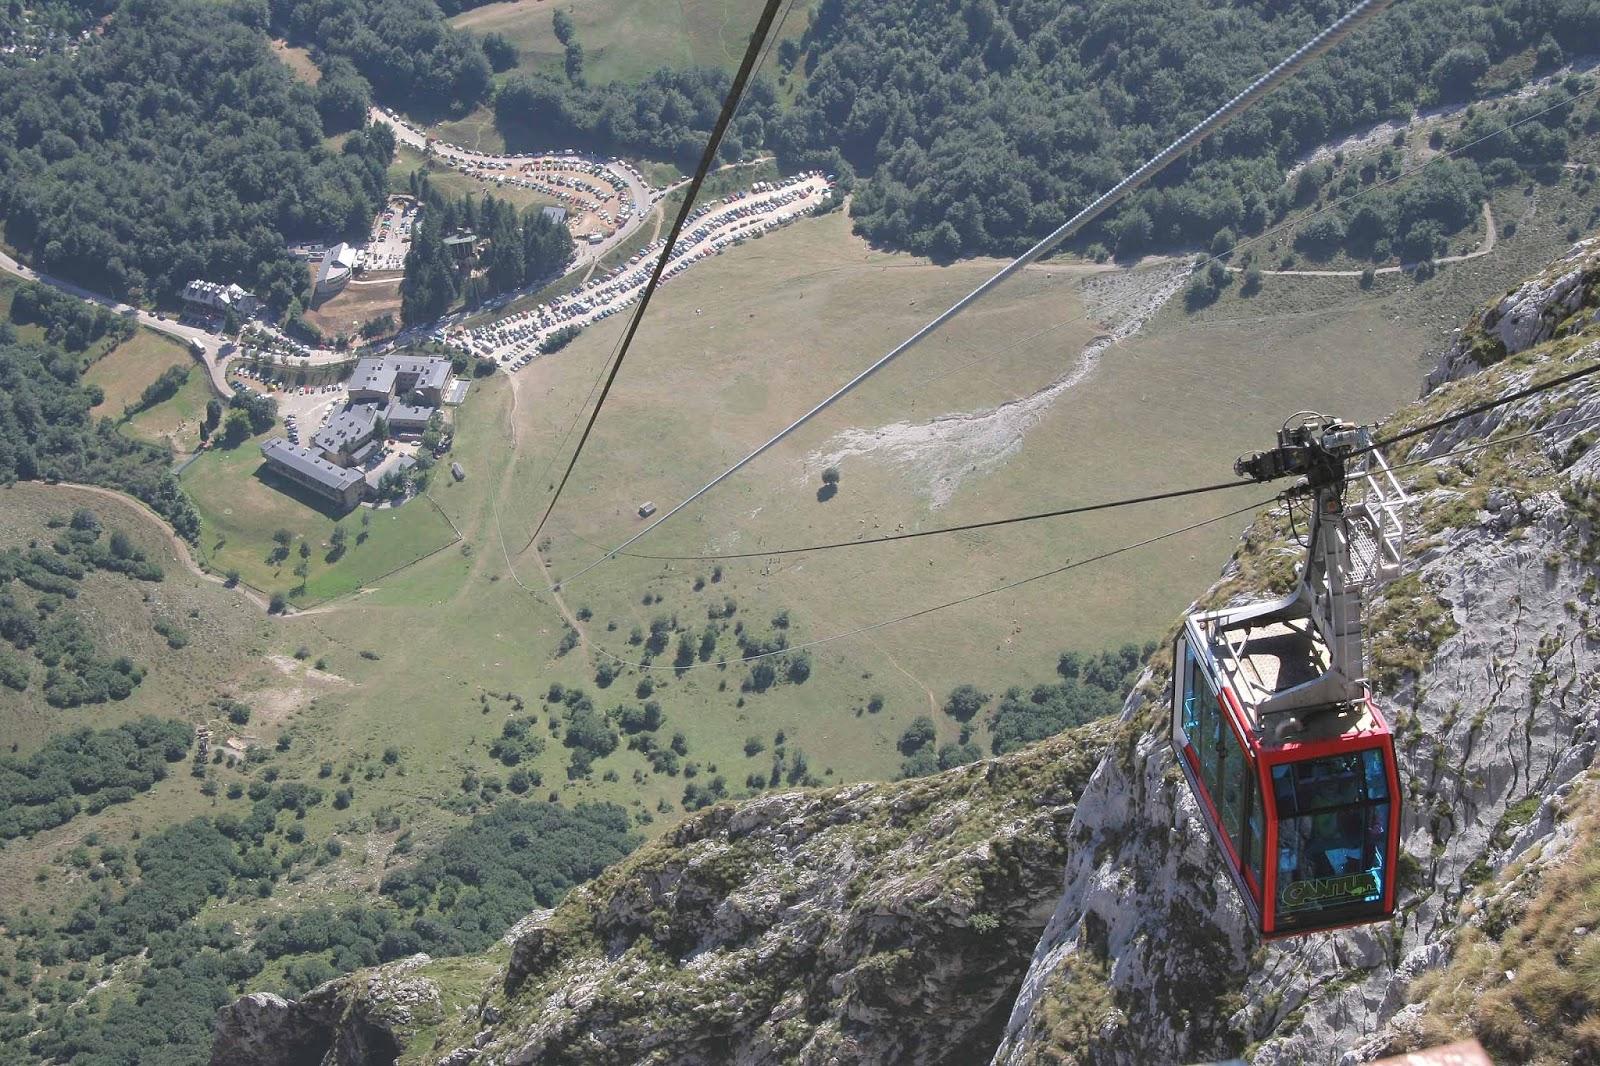 Grupo de Montaña - Patapumparriba: Teleférico de Fuente Dé - Peña Vieja (2.61...